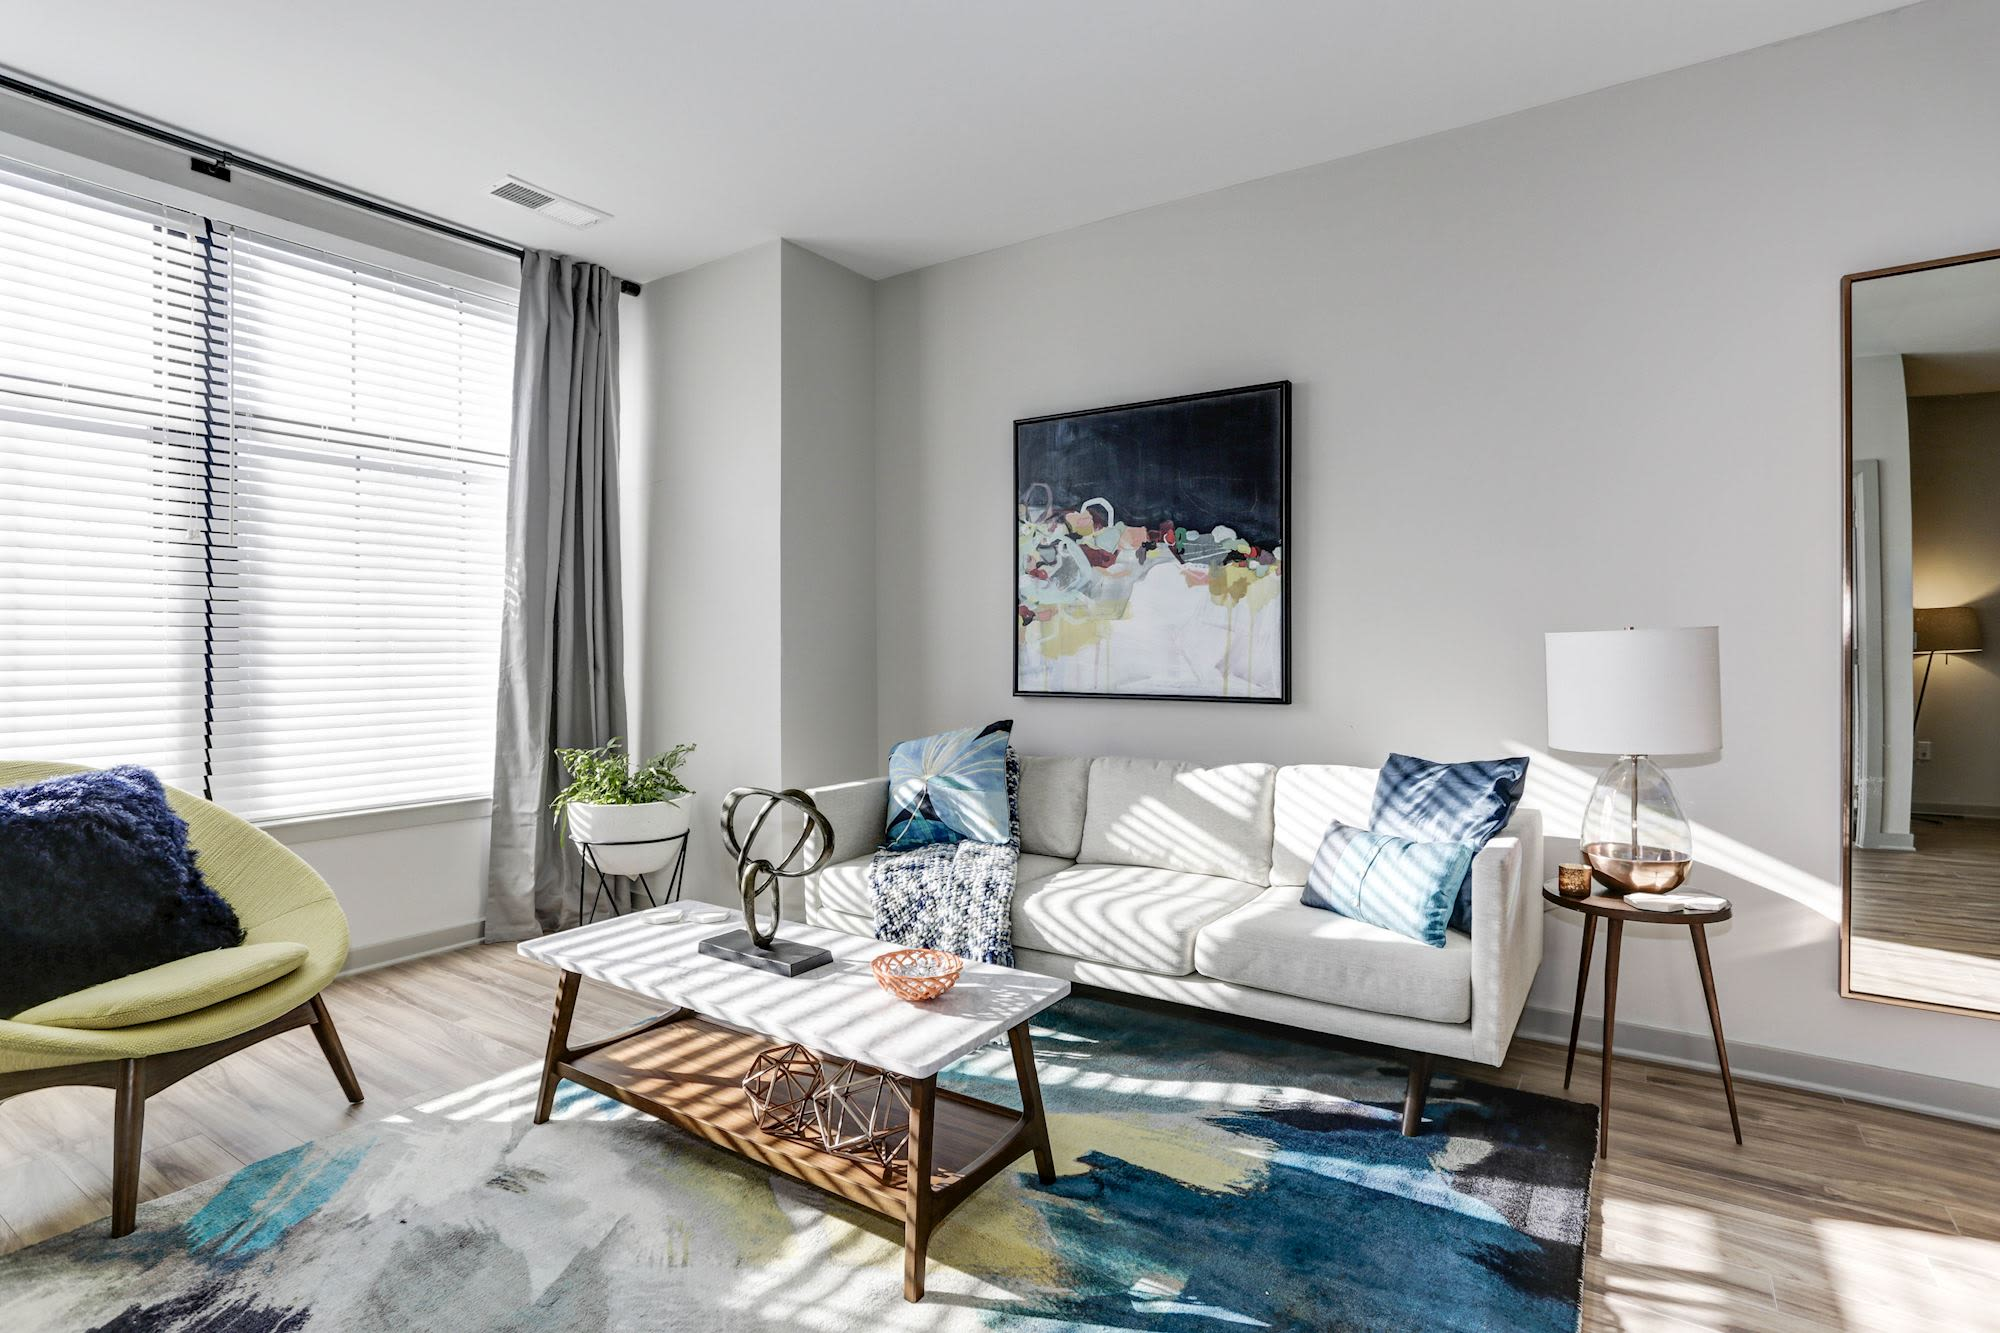 Model living room with lots of natural light at Metropolitan Rockville Town Center in Rockville, Maryland